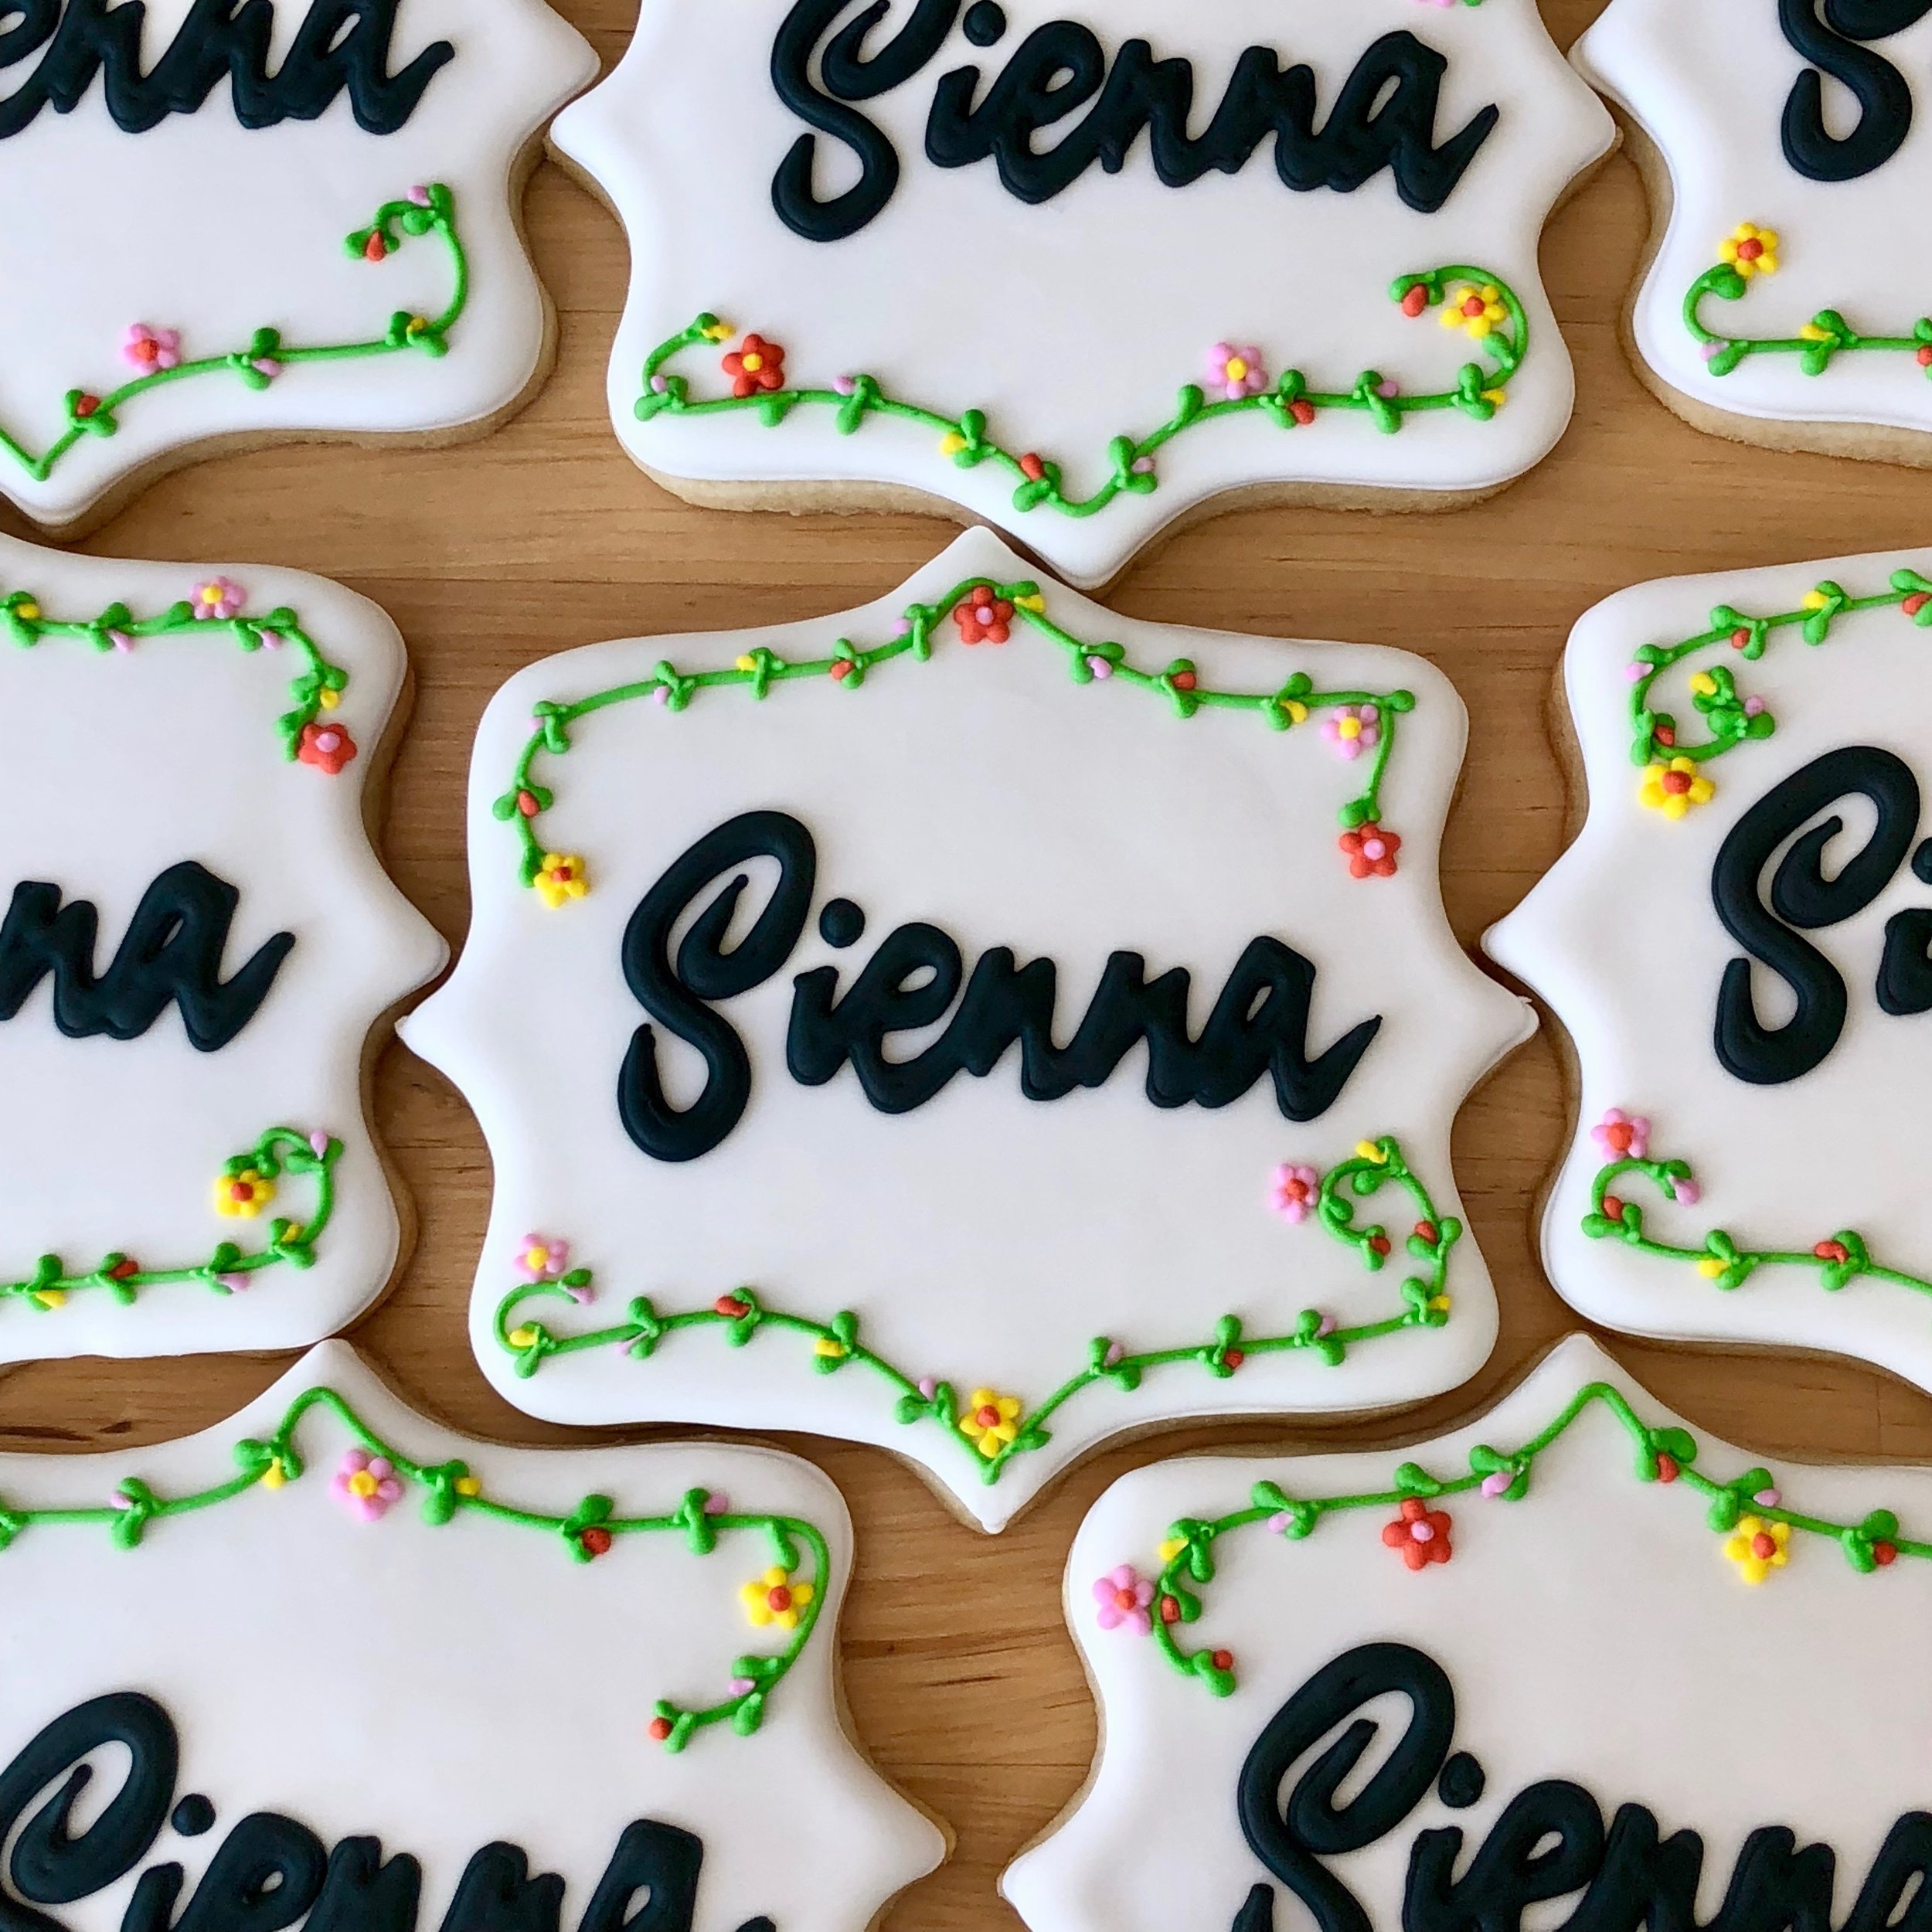 "Detailed Cookies - 4"" - (Seahorses, Plaques, Animals)$12 each24 minimum"